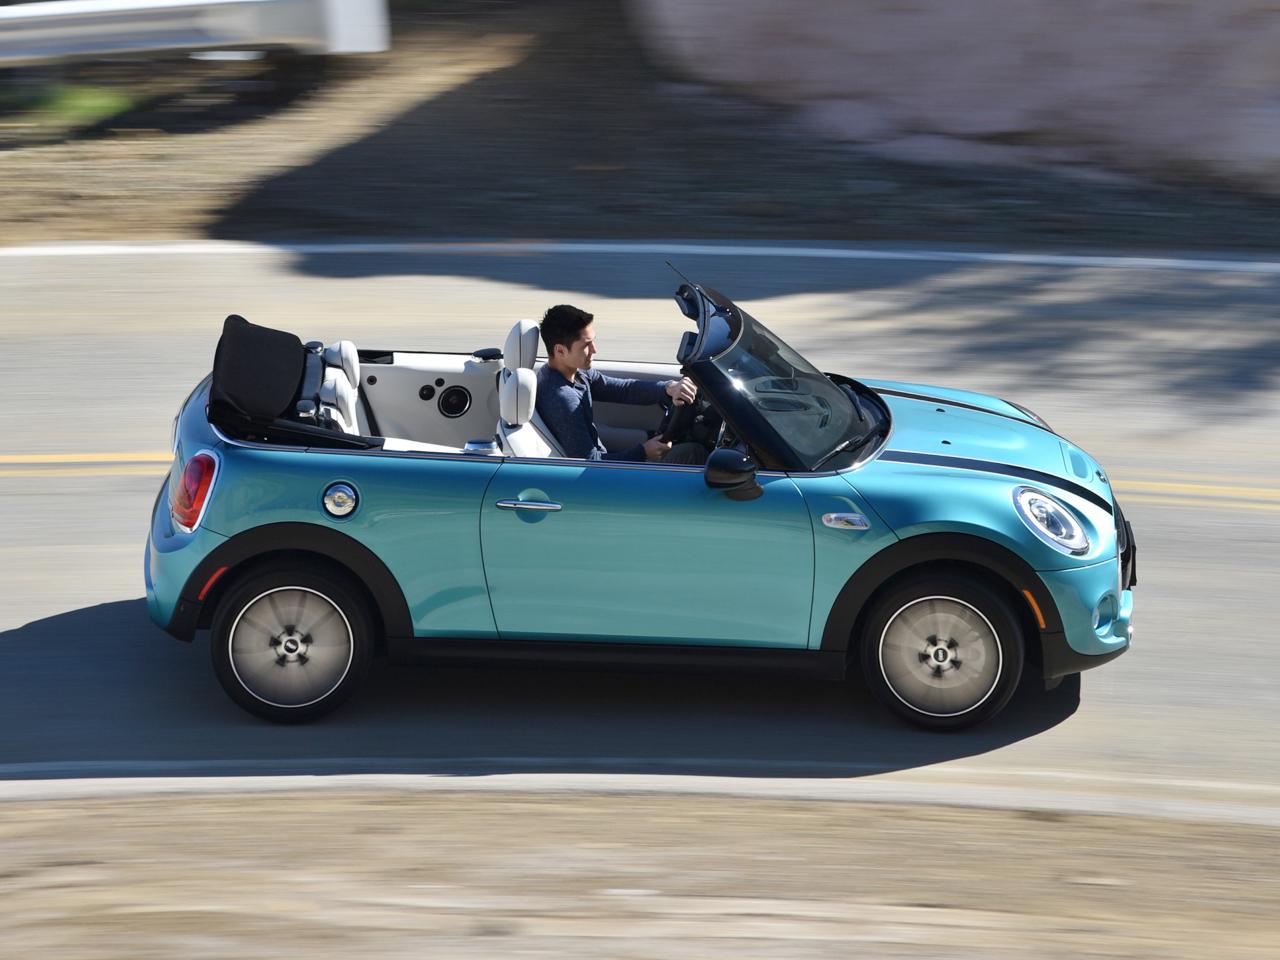 Neues Mini Cooper S Cabrio 2016 Erste Fahrt Autozeitungde